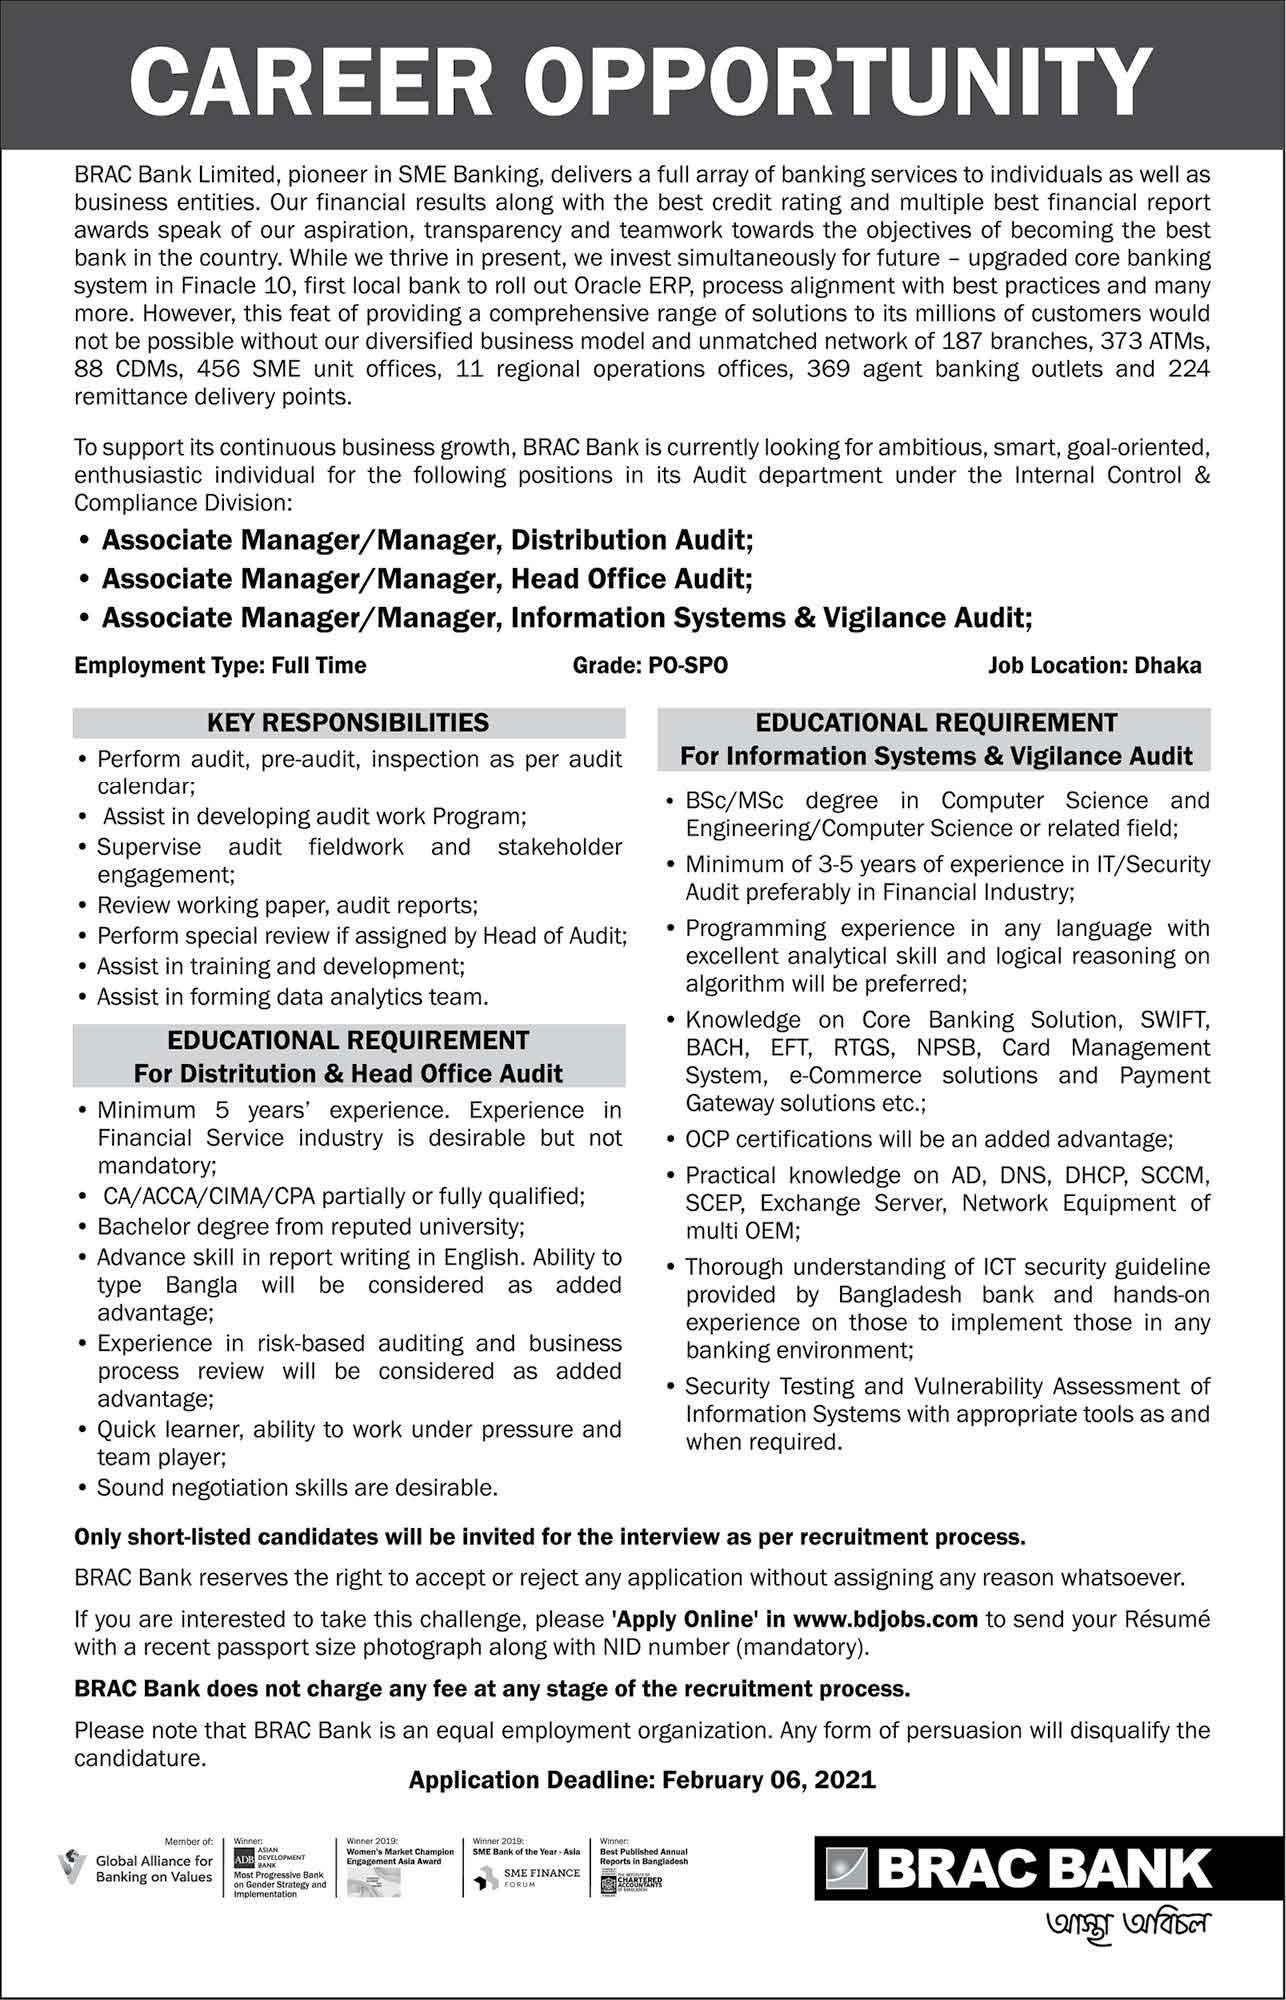 Brac Bank Job Circular 2021 - ব্র্যাক ব্যাংকে নিয়োগ বিজ্ঞপ্তি ২০২১